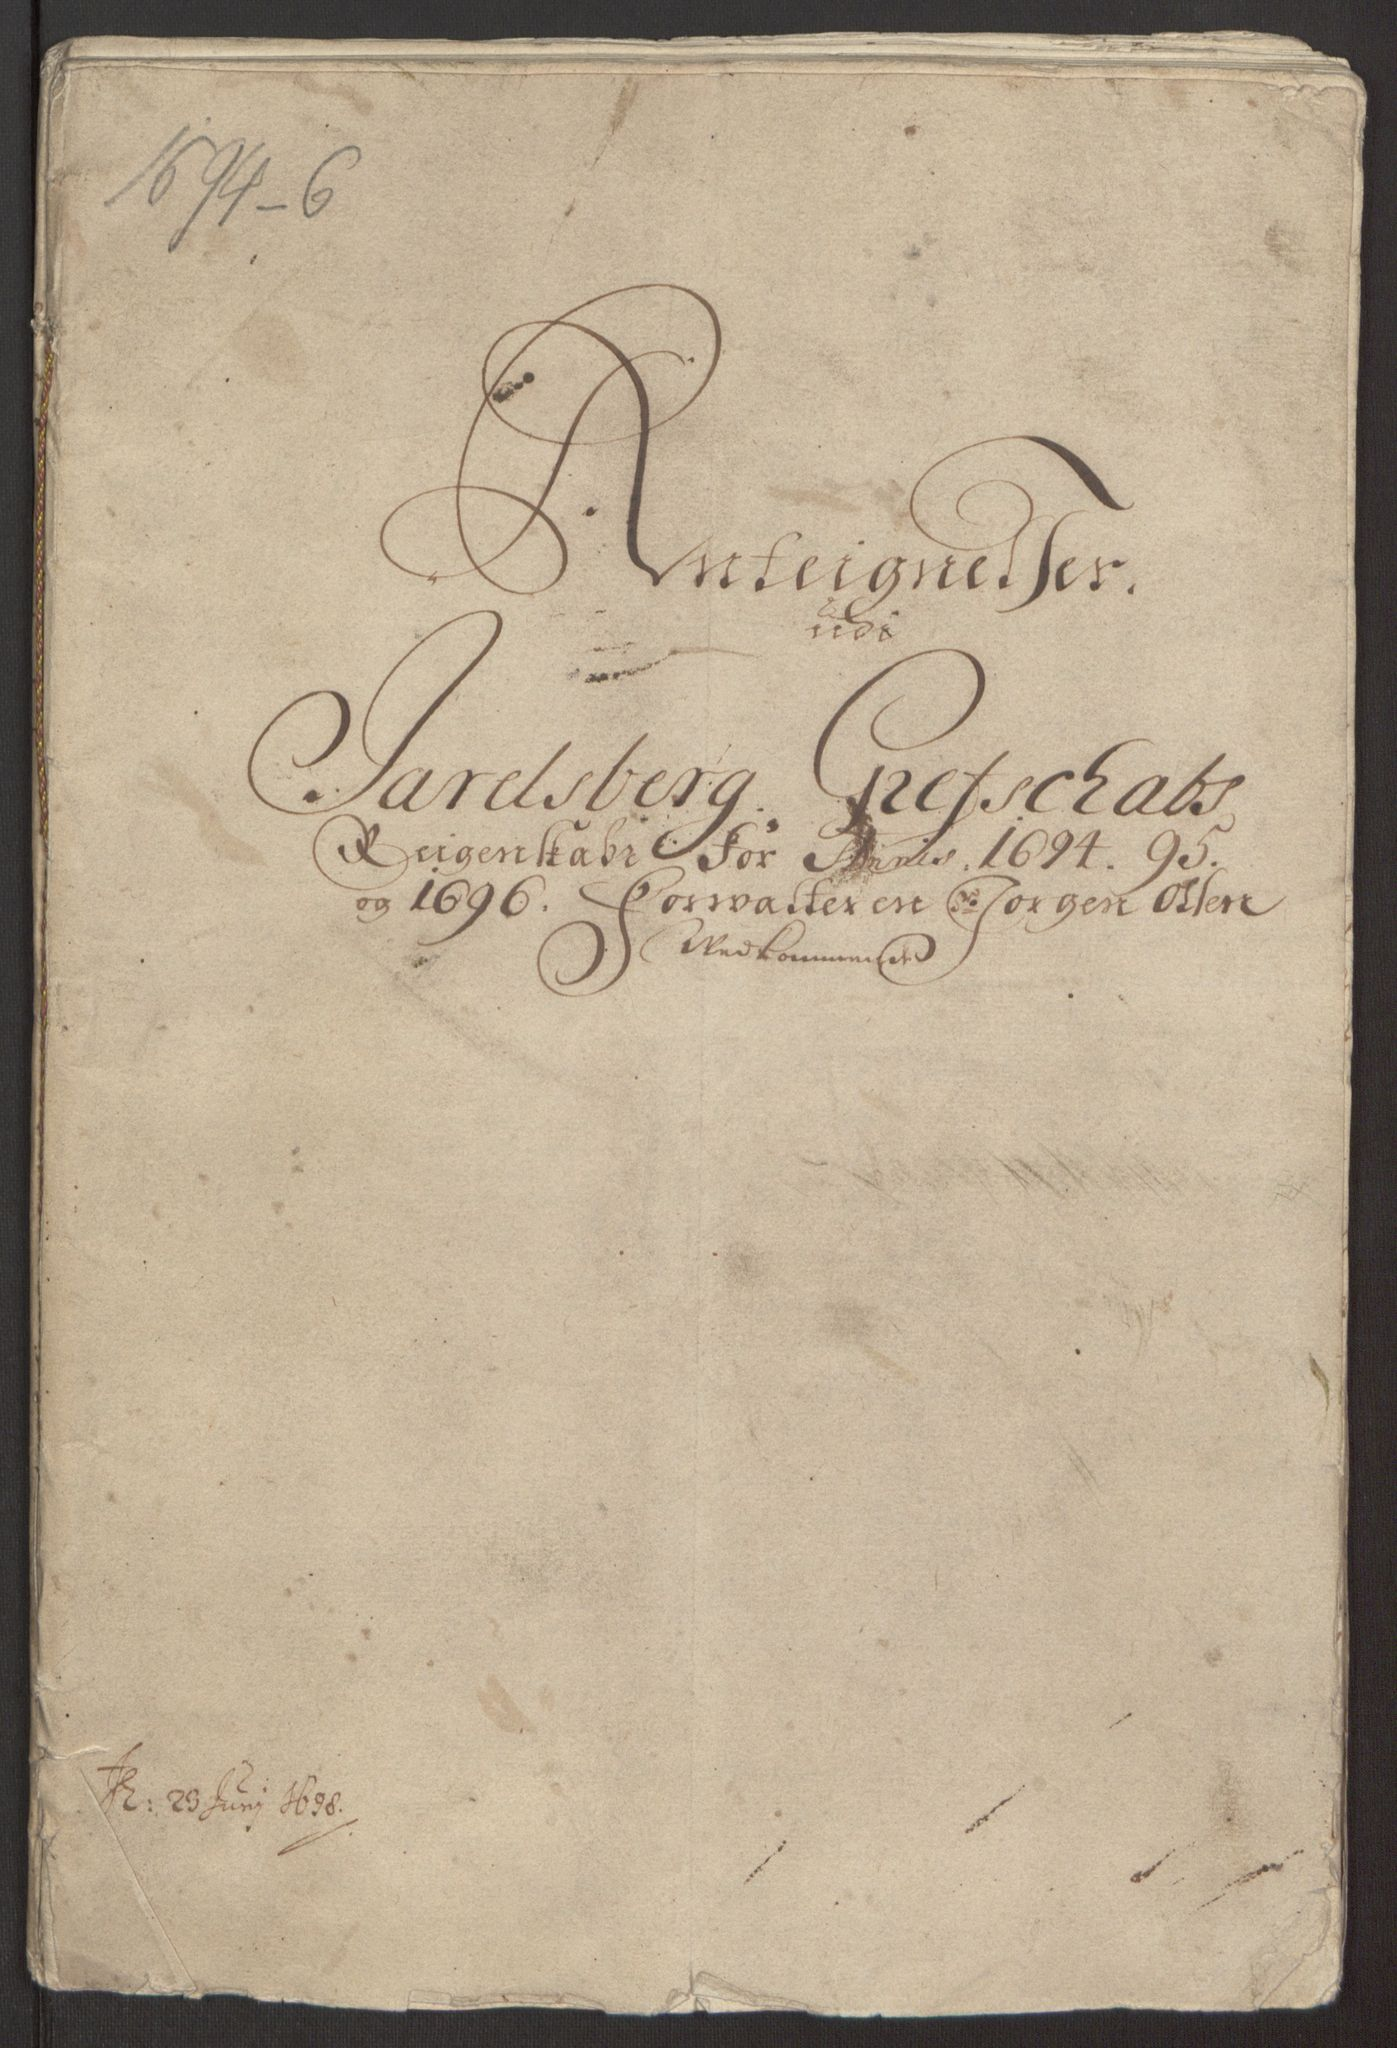 RA, Rentekammeret inntil 1814, Reviderte regnskaper, Fogderegnskap, R32/L1867: Fogderegnskap Jarlsberg grevskap, 1694-1696, s. 389